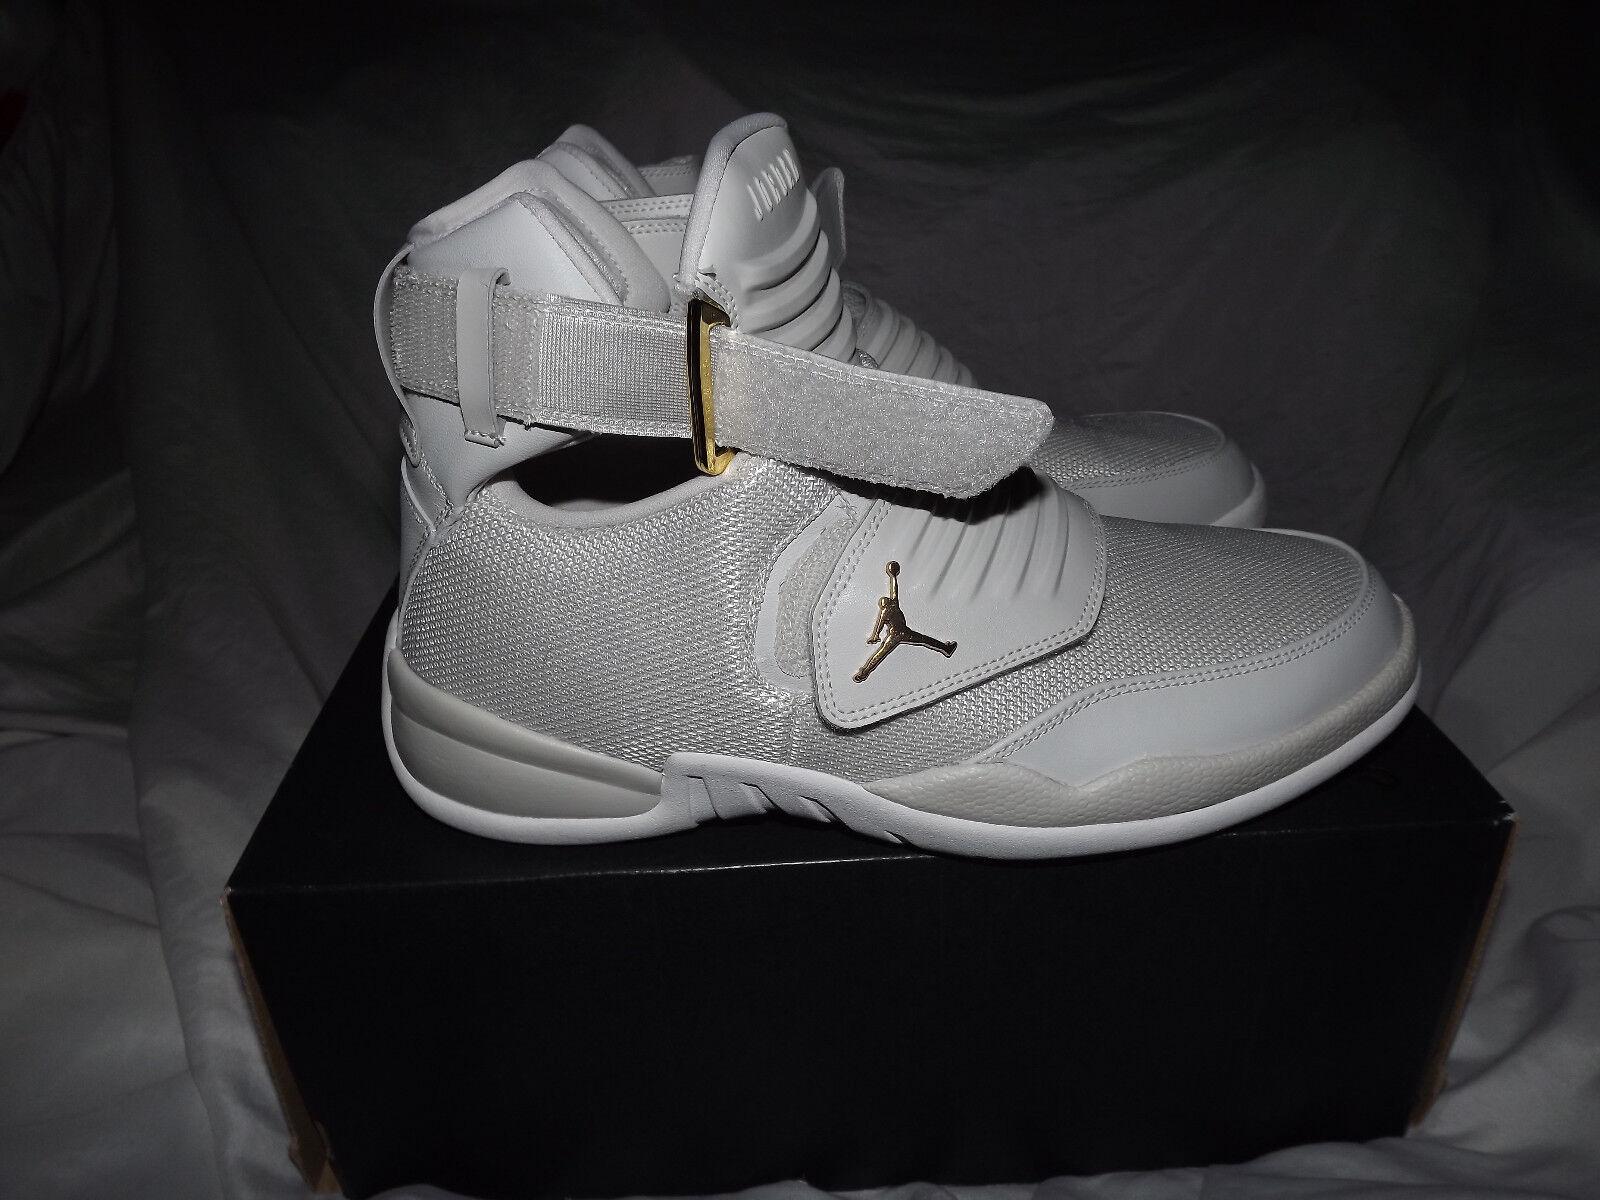 ba54f2741adb Спортивная обувь для мужчины NIKE AIR JORDAN GENERATION 23 MEN S BASKETBALL  SHOES AA1294 005 SIZE 11.5 NEW - 273630545204 - купить на eBay.com (США) с  ...